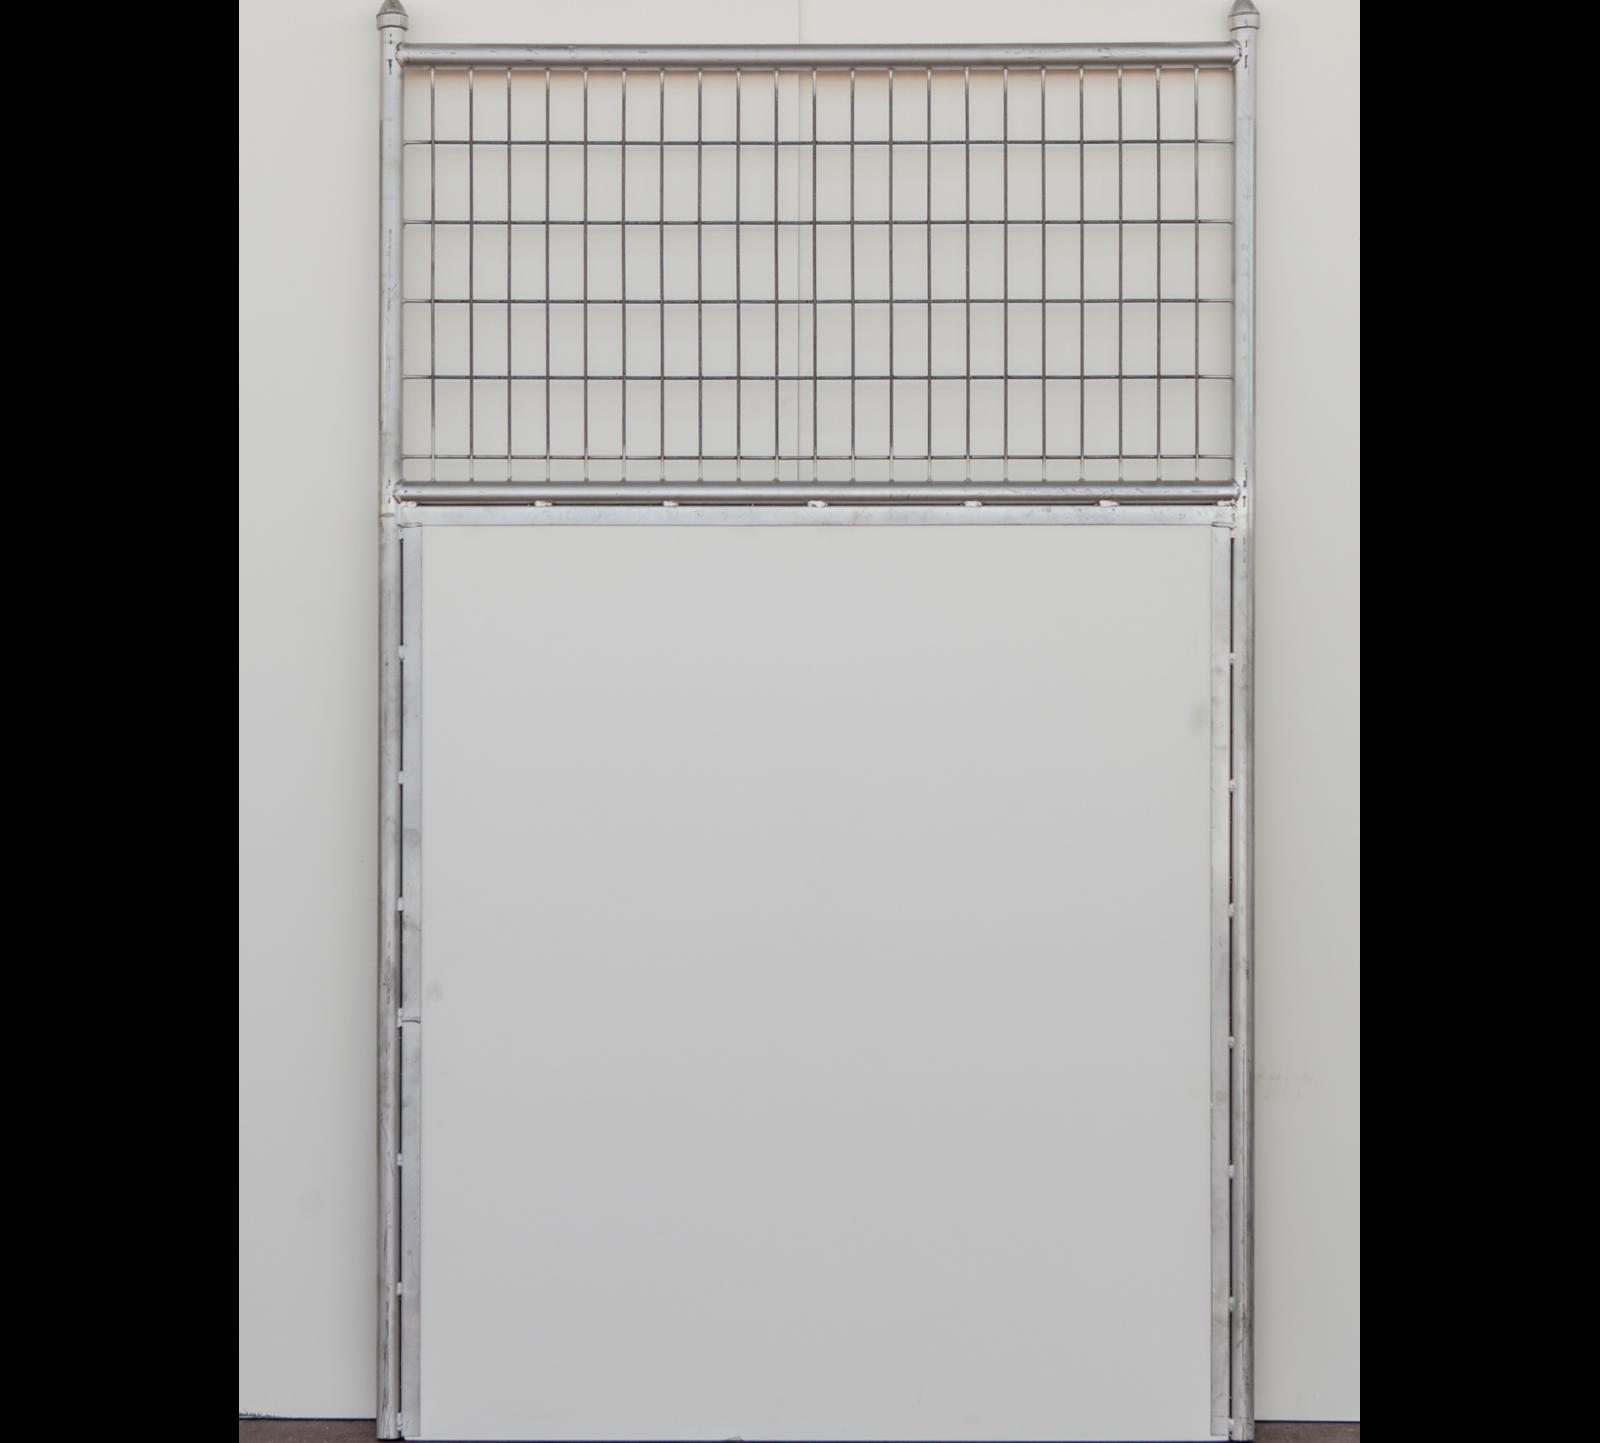 4 foot high interior divider panel dog kennel options